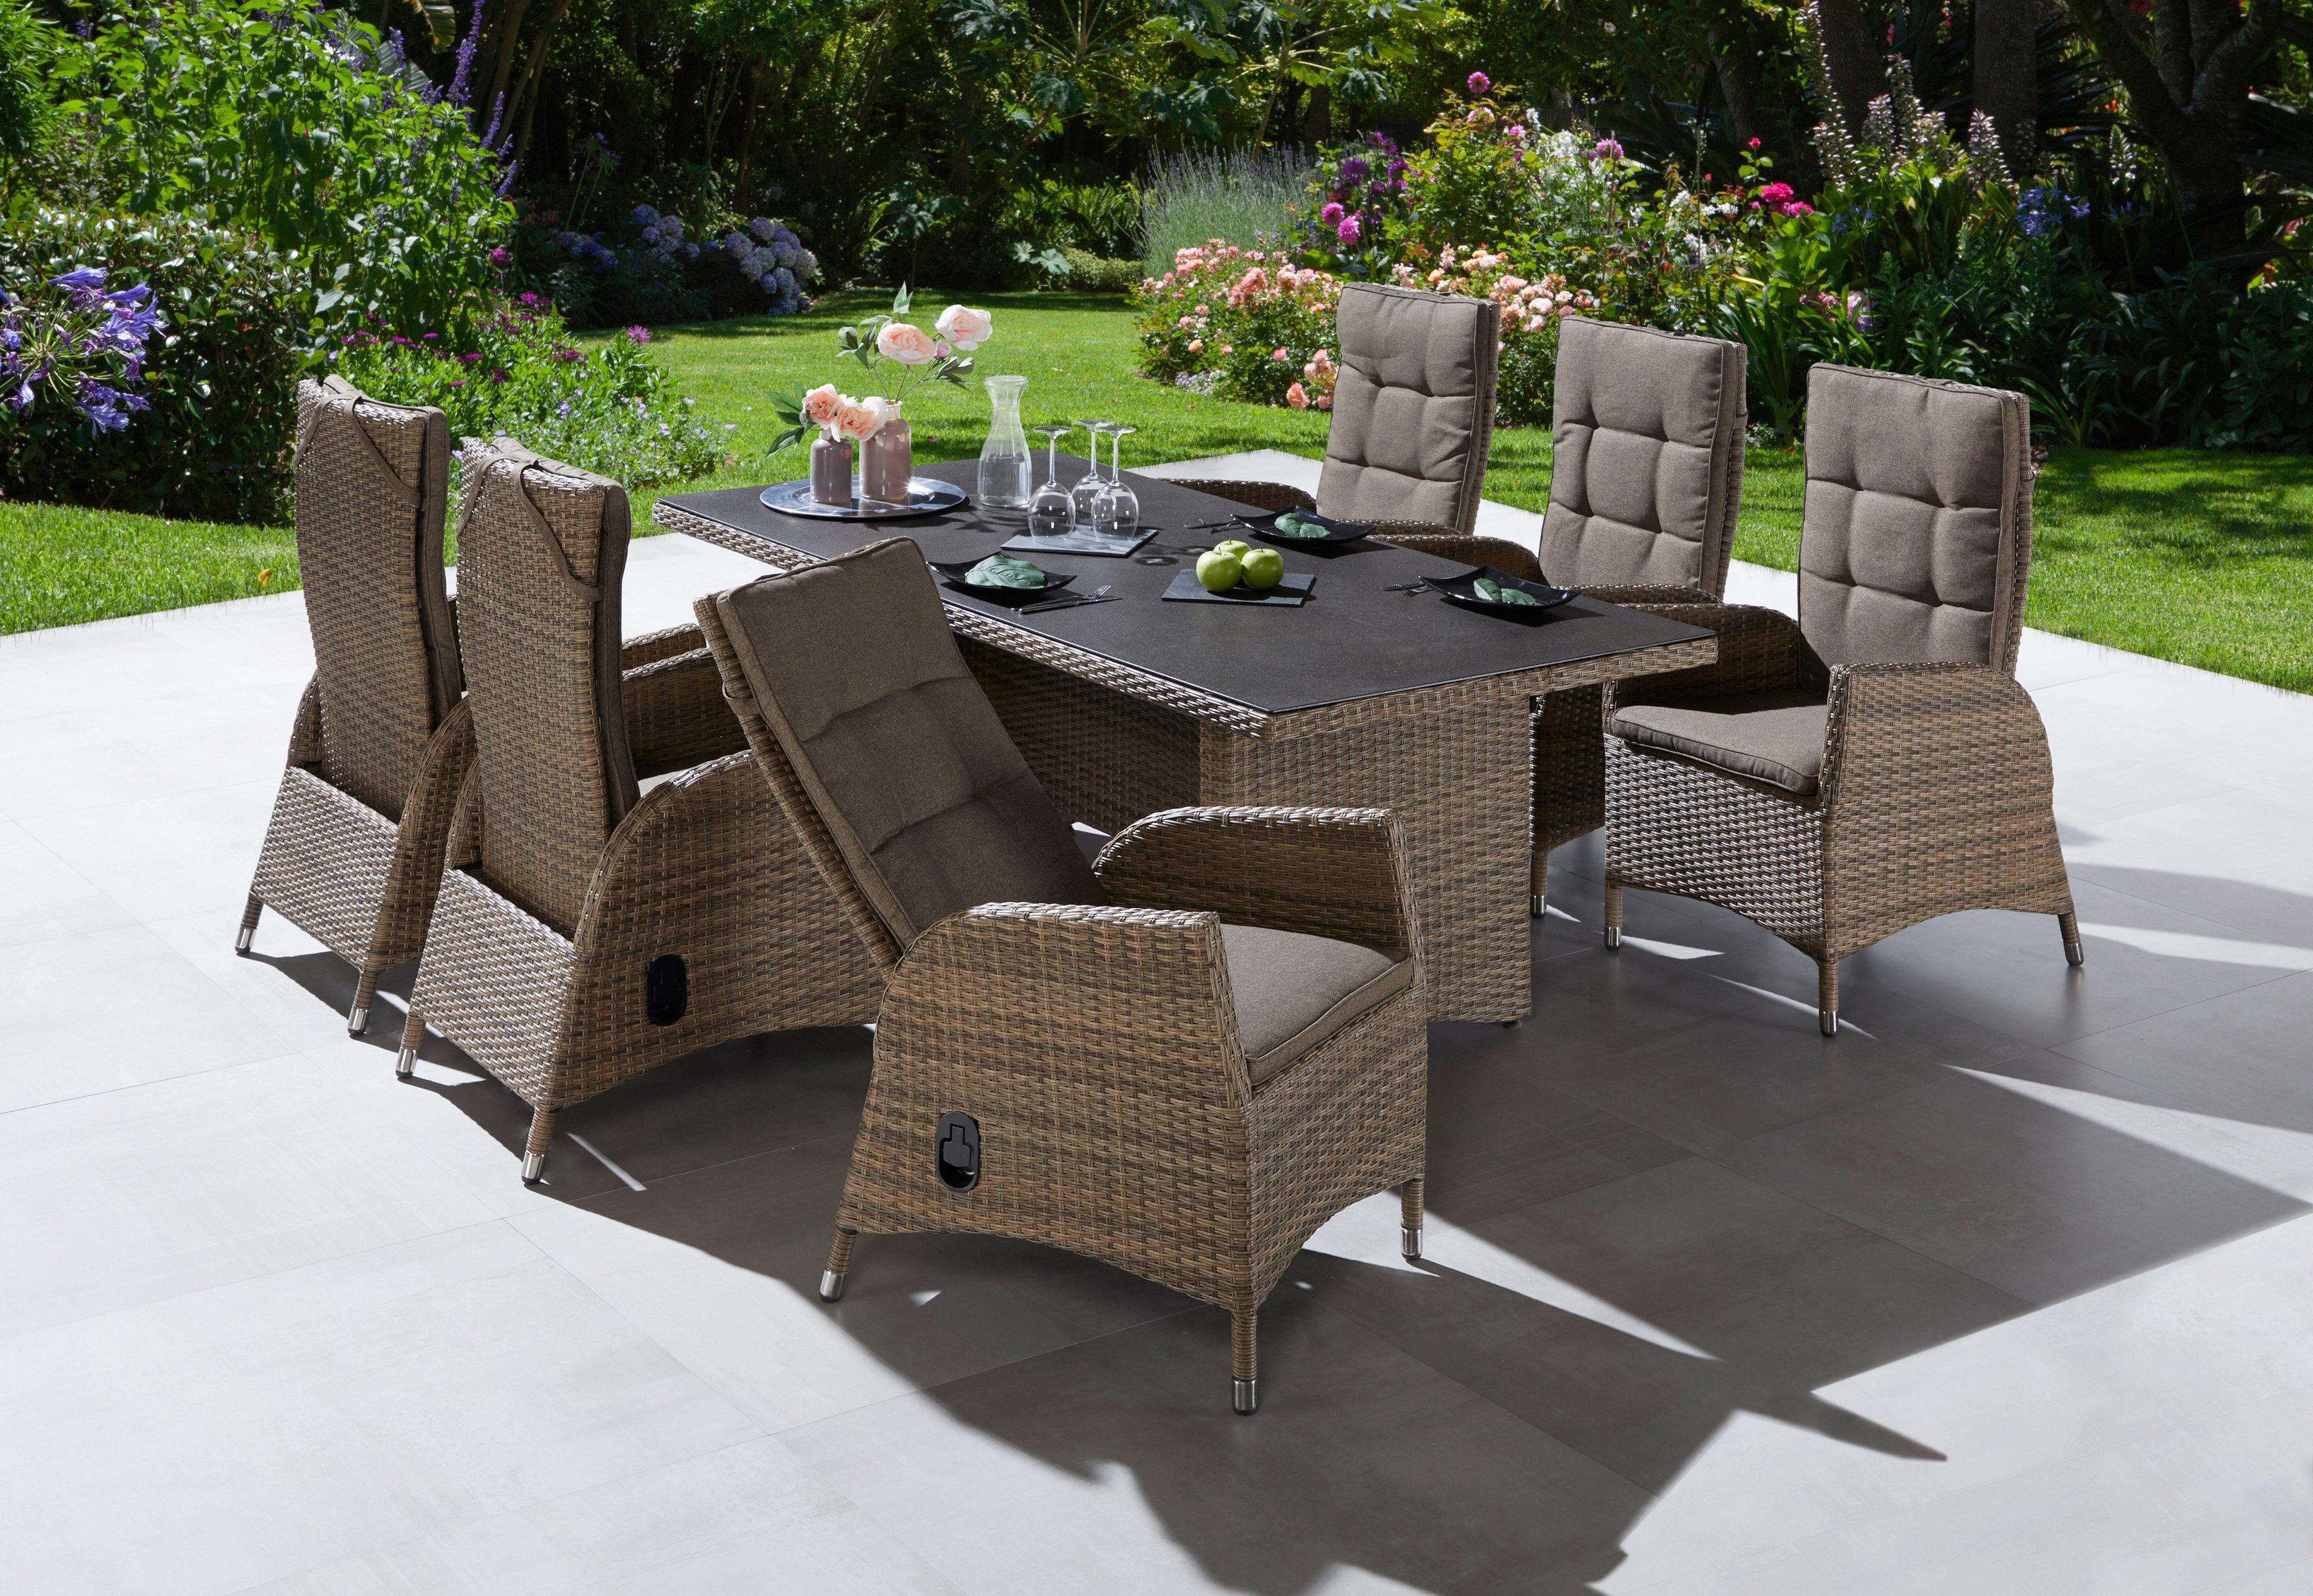 PLOSS Gartenmöbelset »Tokio«, 13-tlg., 6 Sesseln, Tisch 200x95 cm, Polyrattan